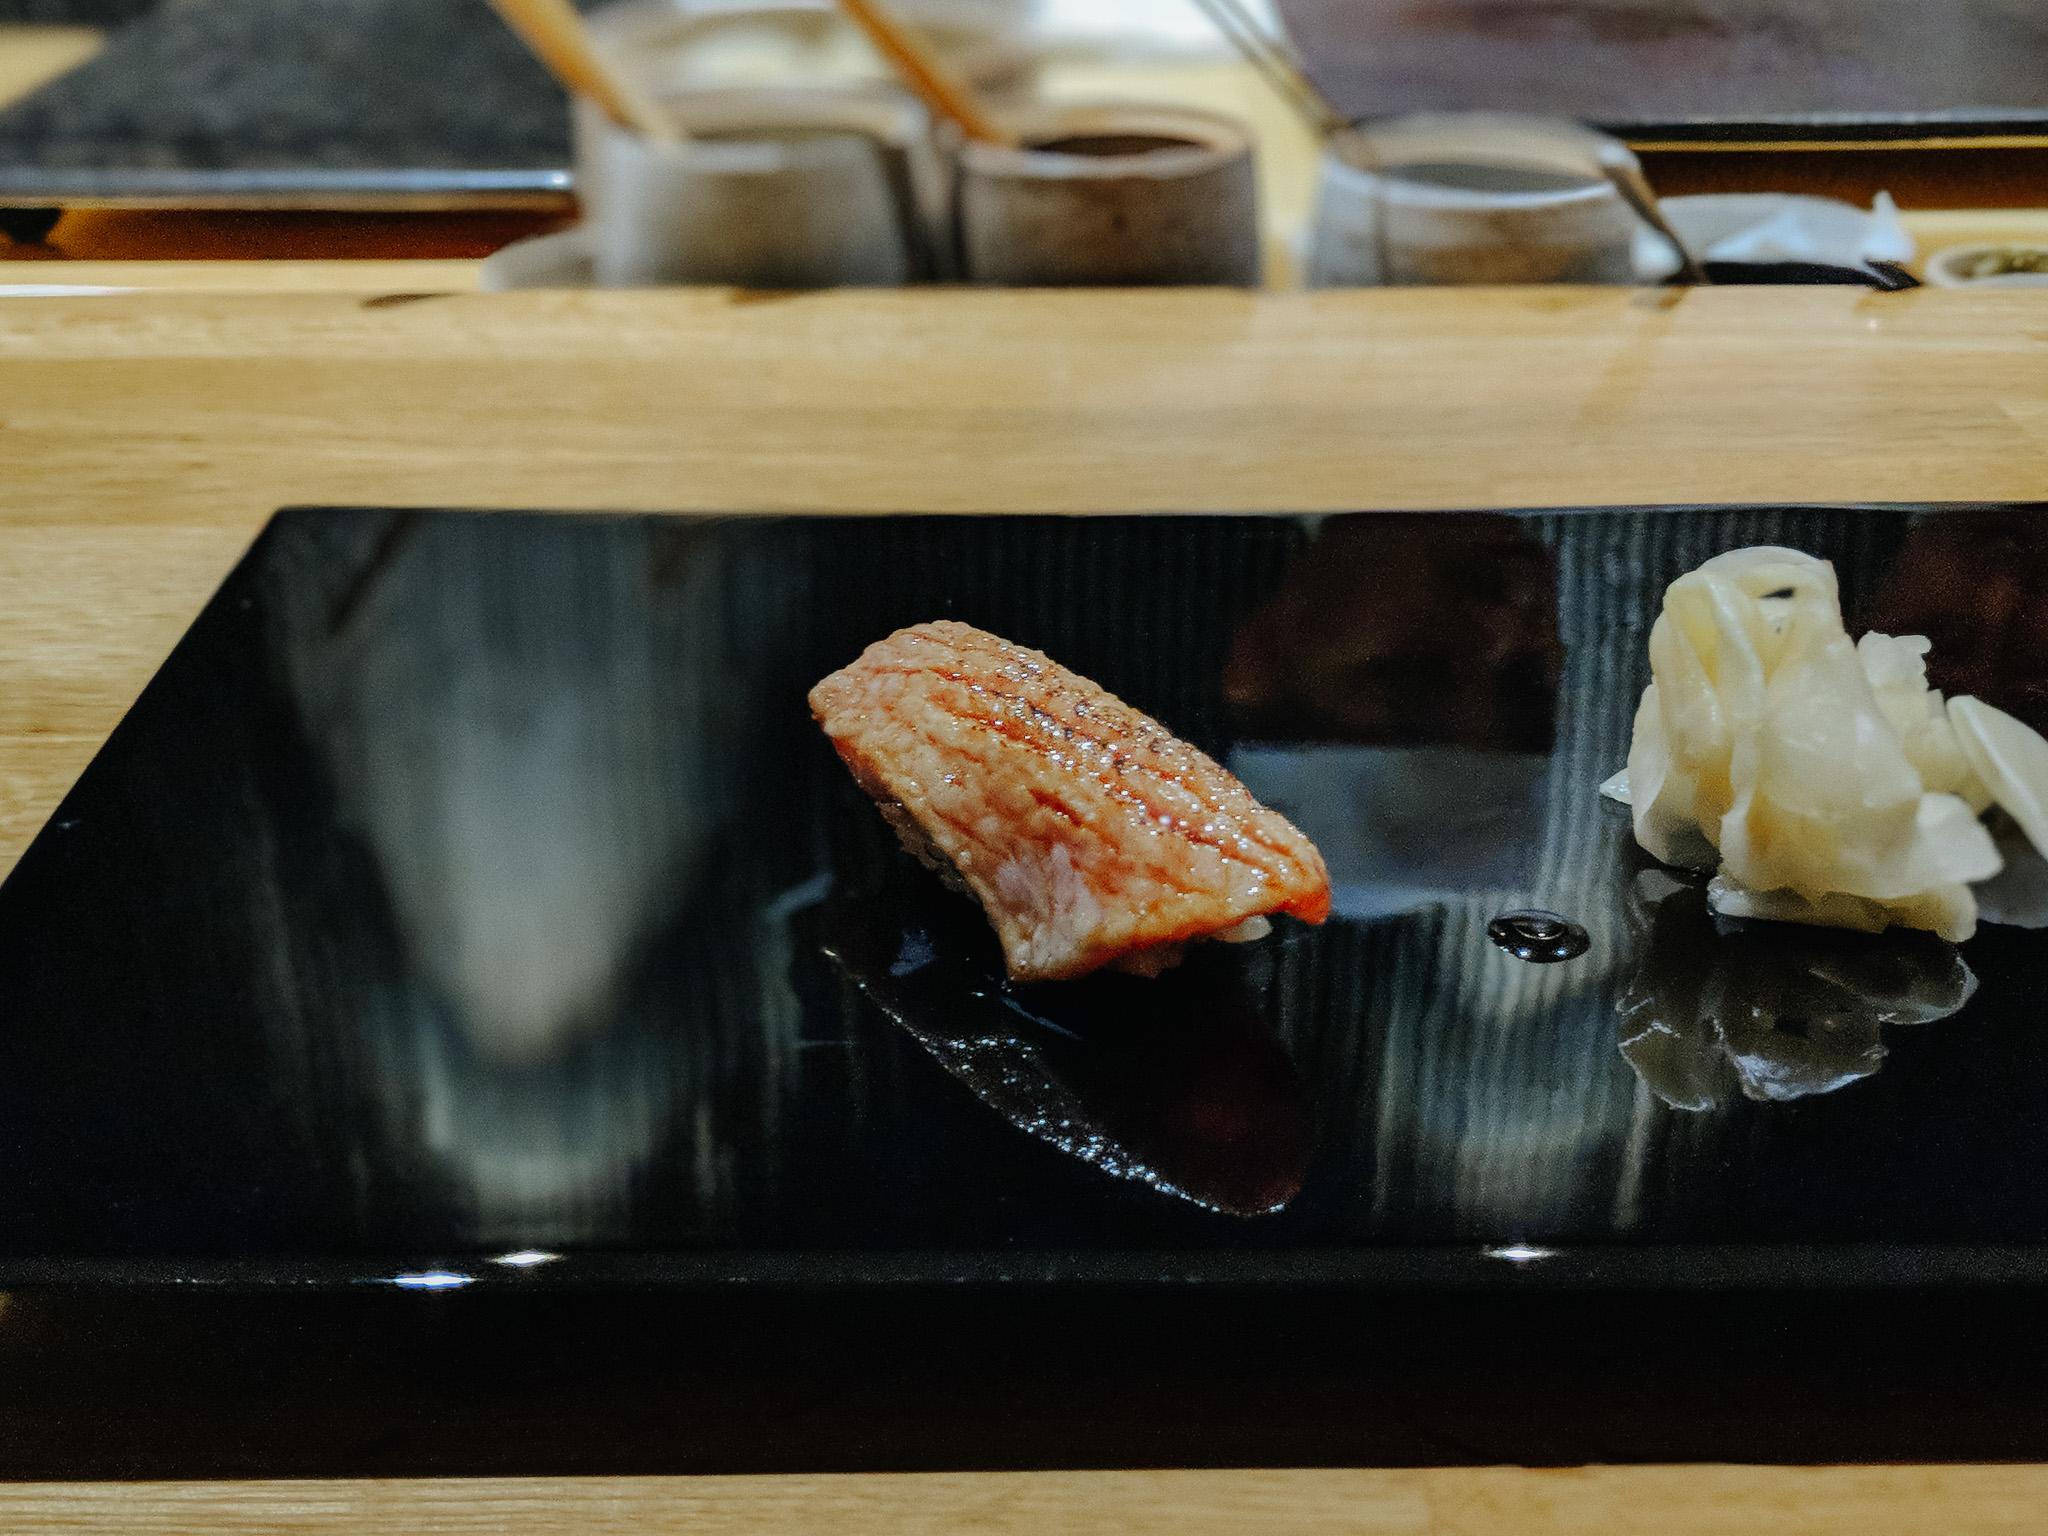 minamishima-melbourne-food-photographer-011.JPG